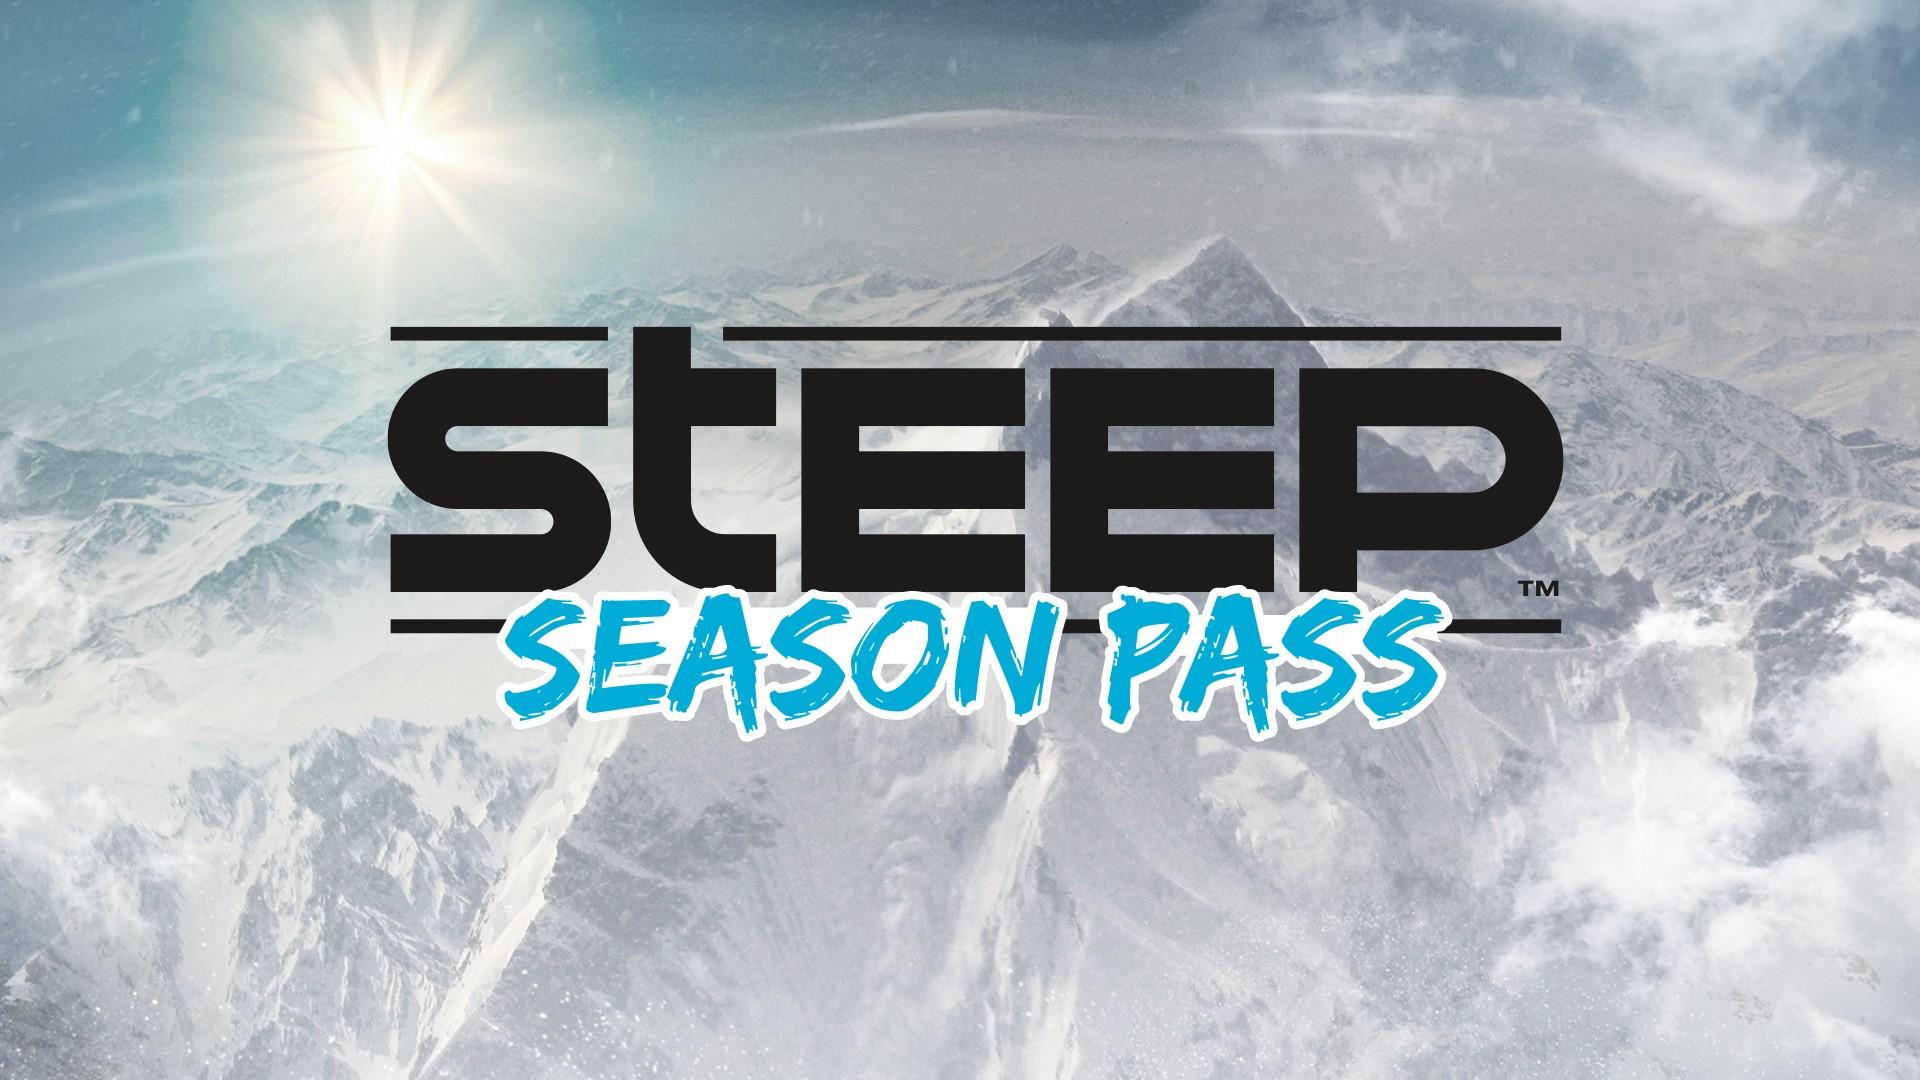 Steep + Season pass+WinterFest DLC+Extreme Pack